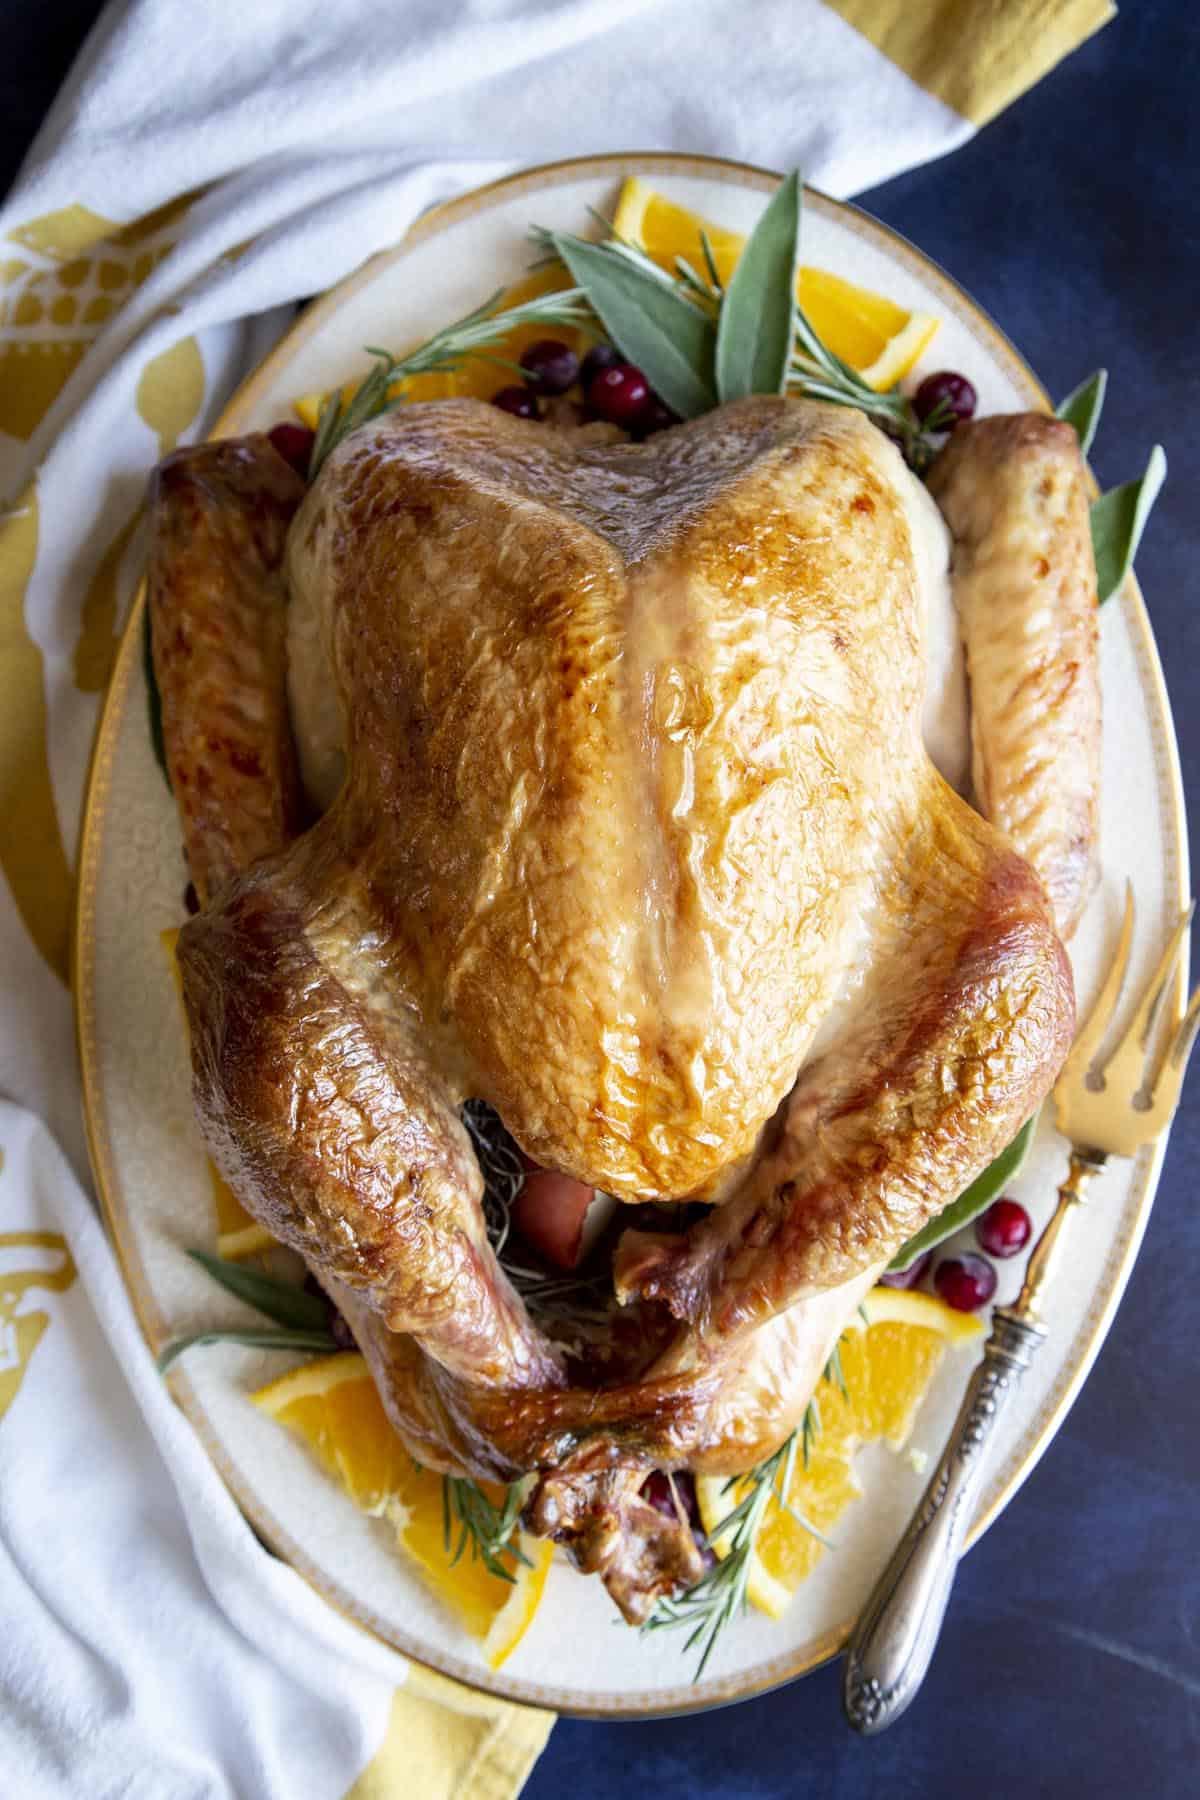 A roast turkey on a serving platter